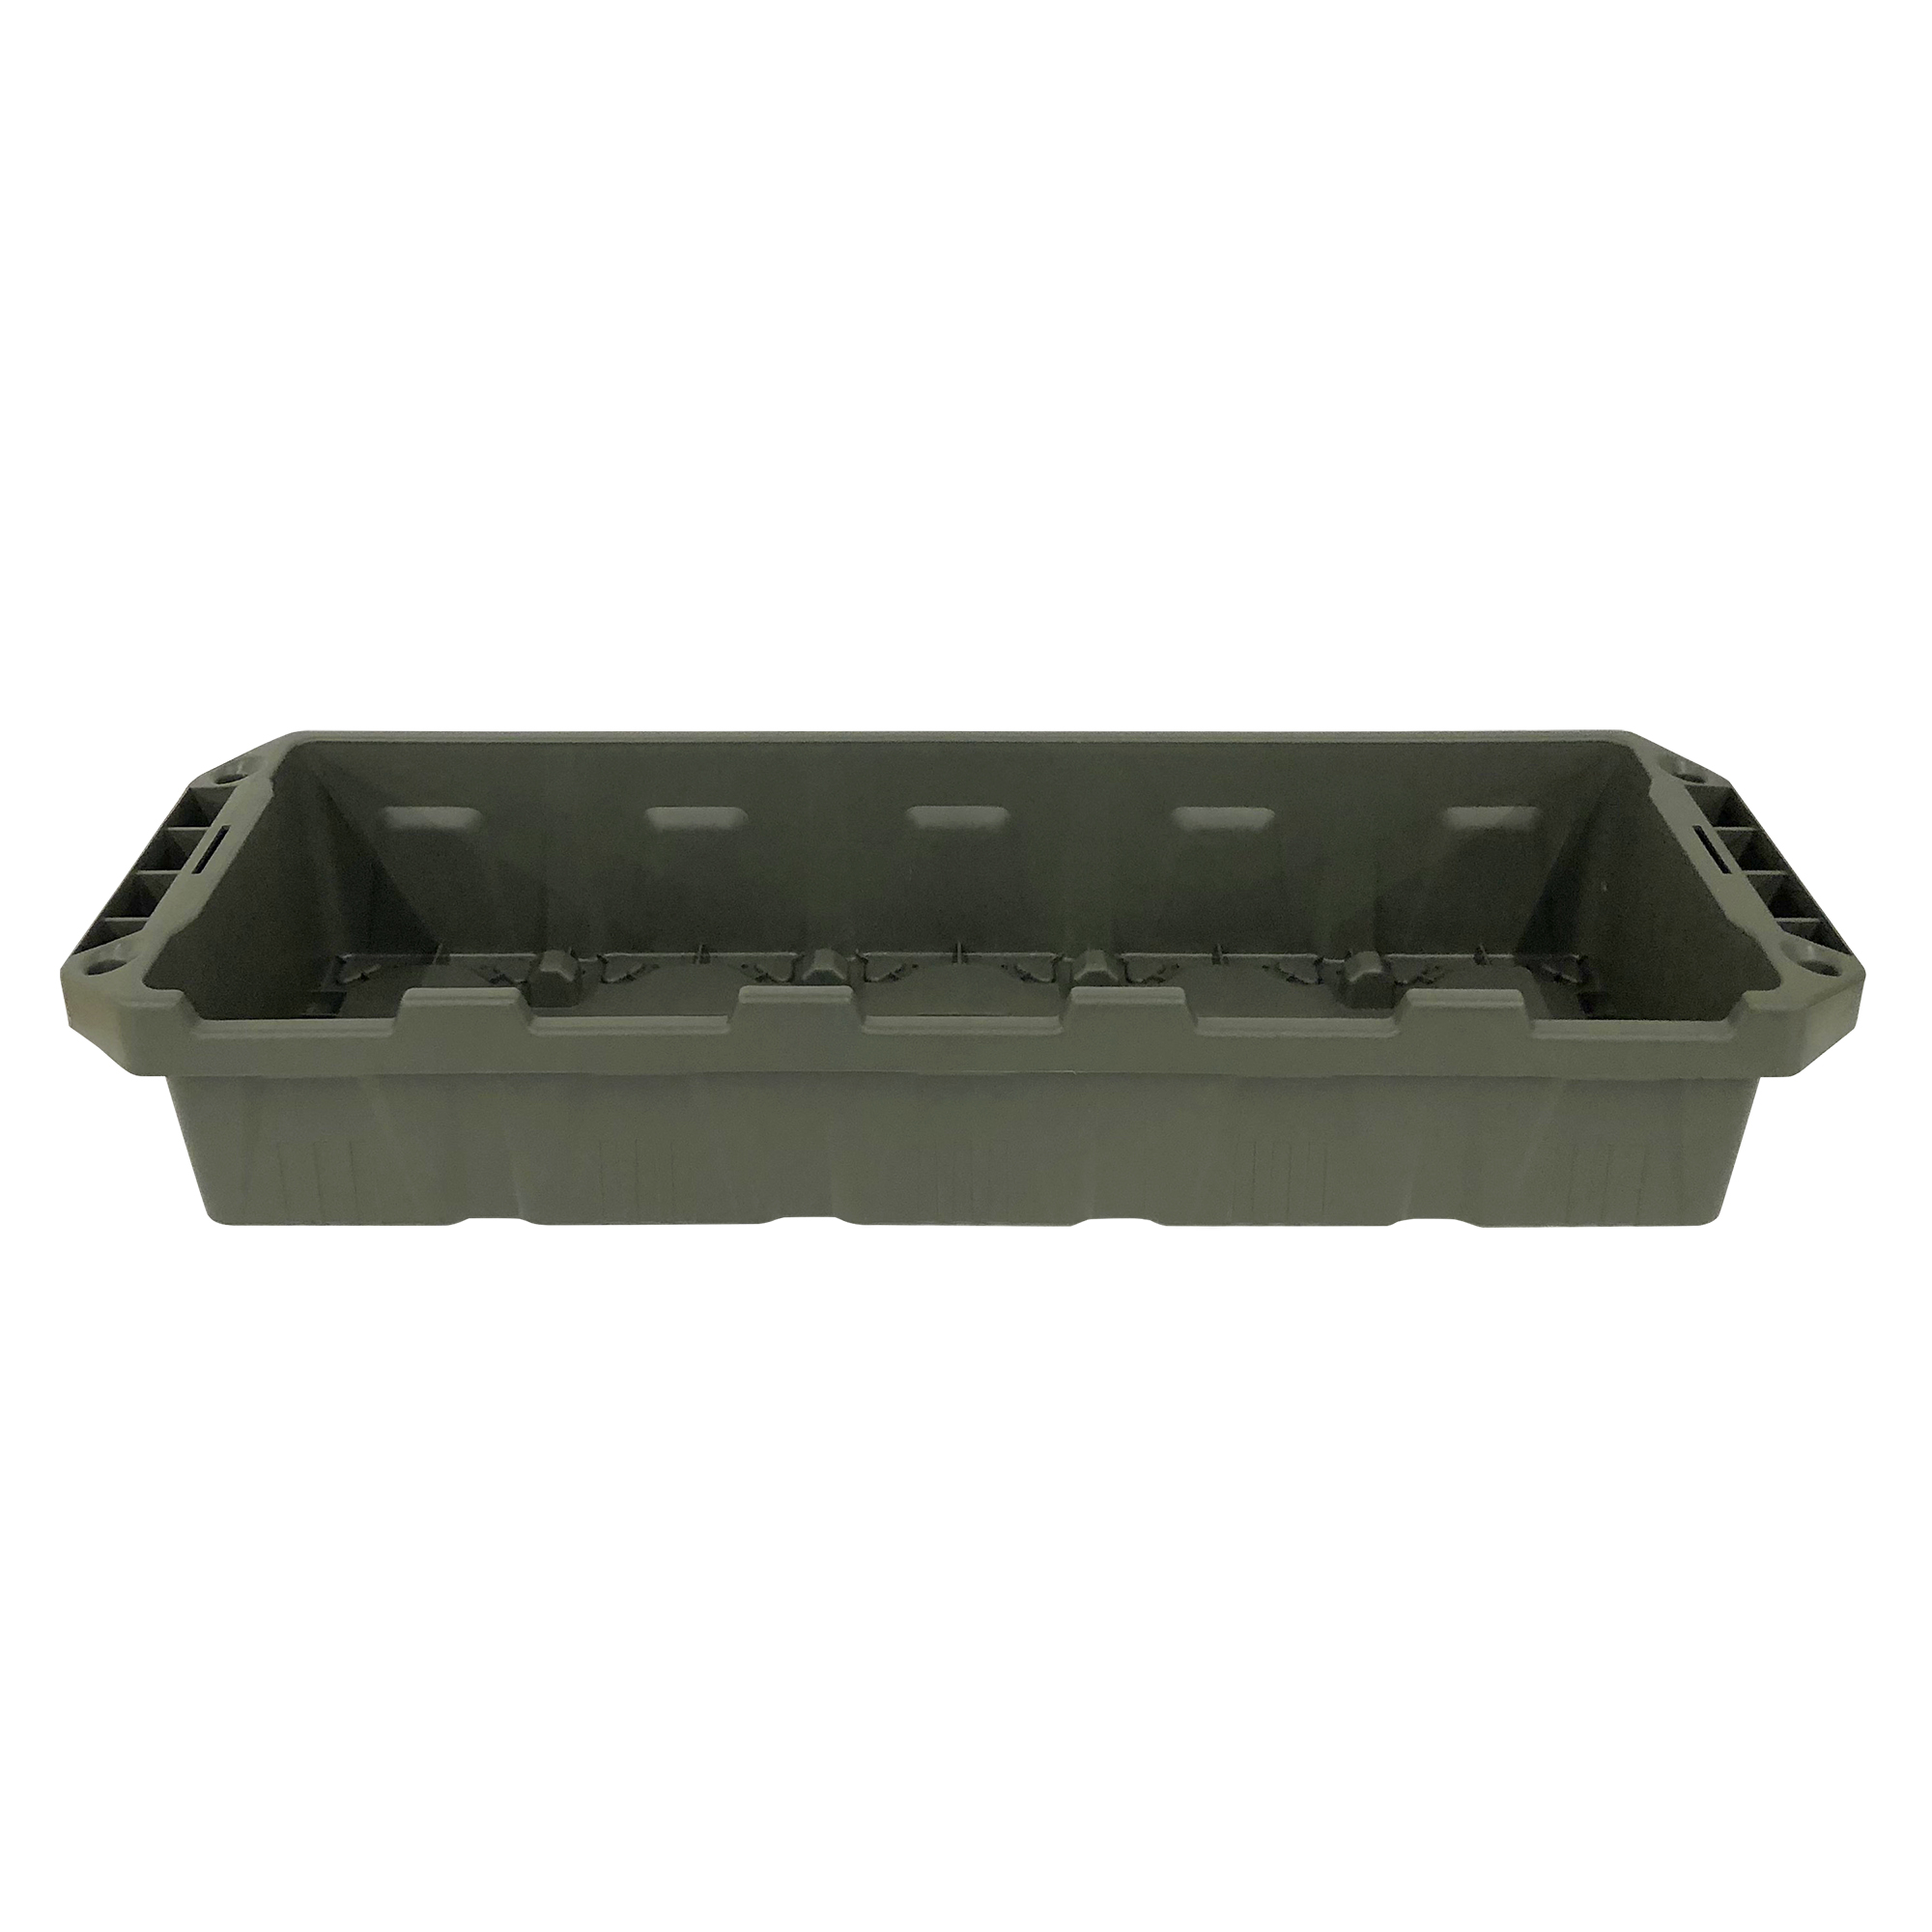 MTM 5-Can Mini Ammo Box Crate, OD Green